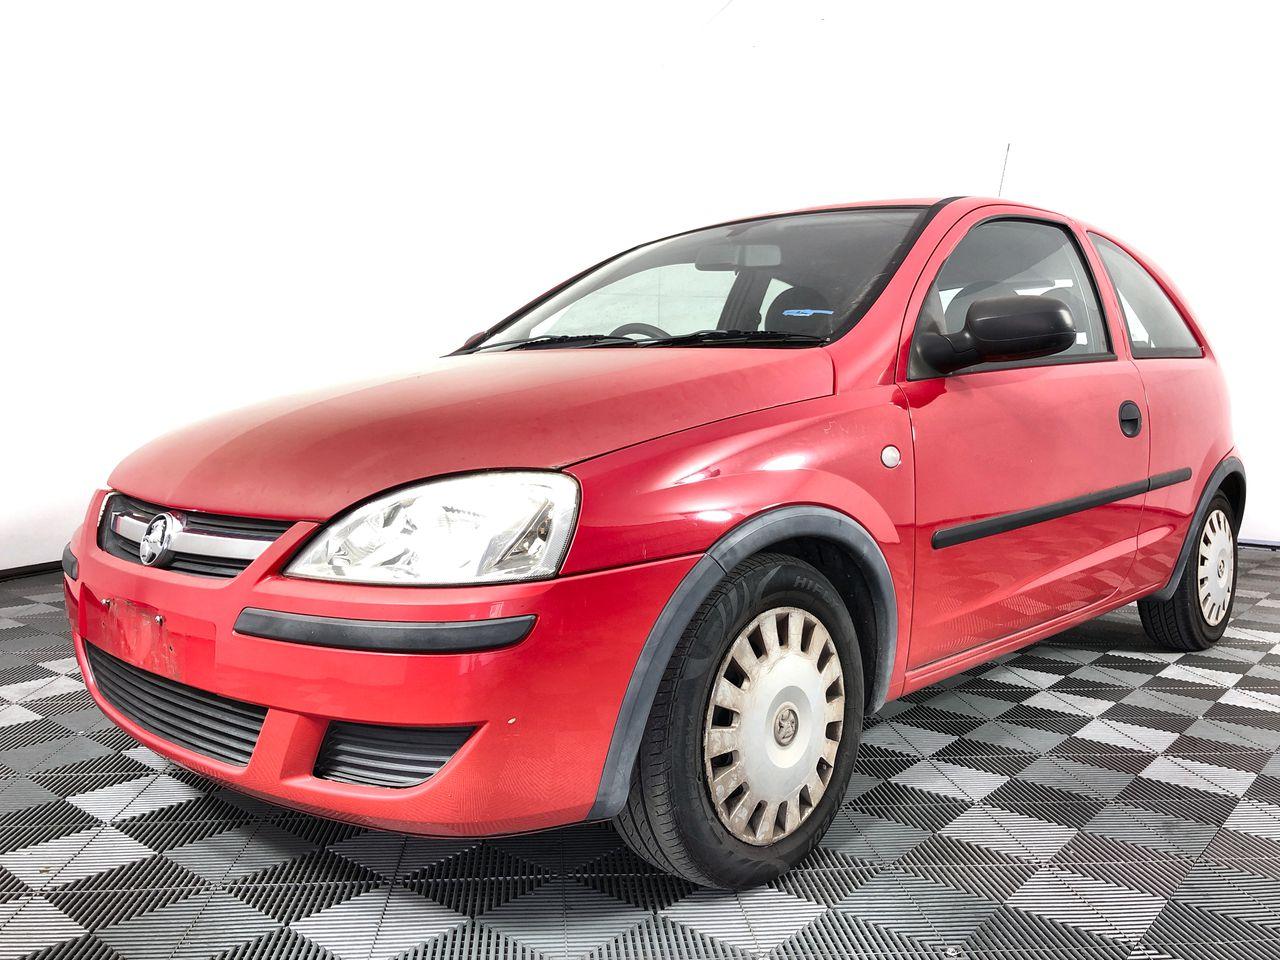 2004 Holden Barina XC Automatic Hatchback, 101,634km